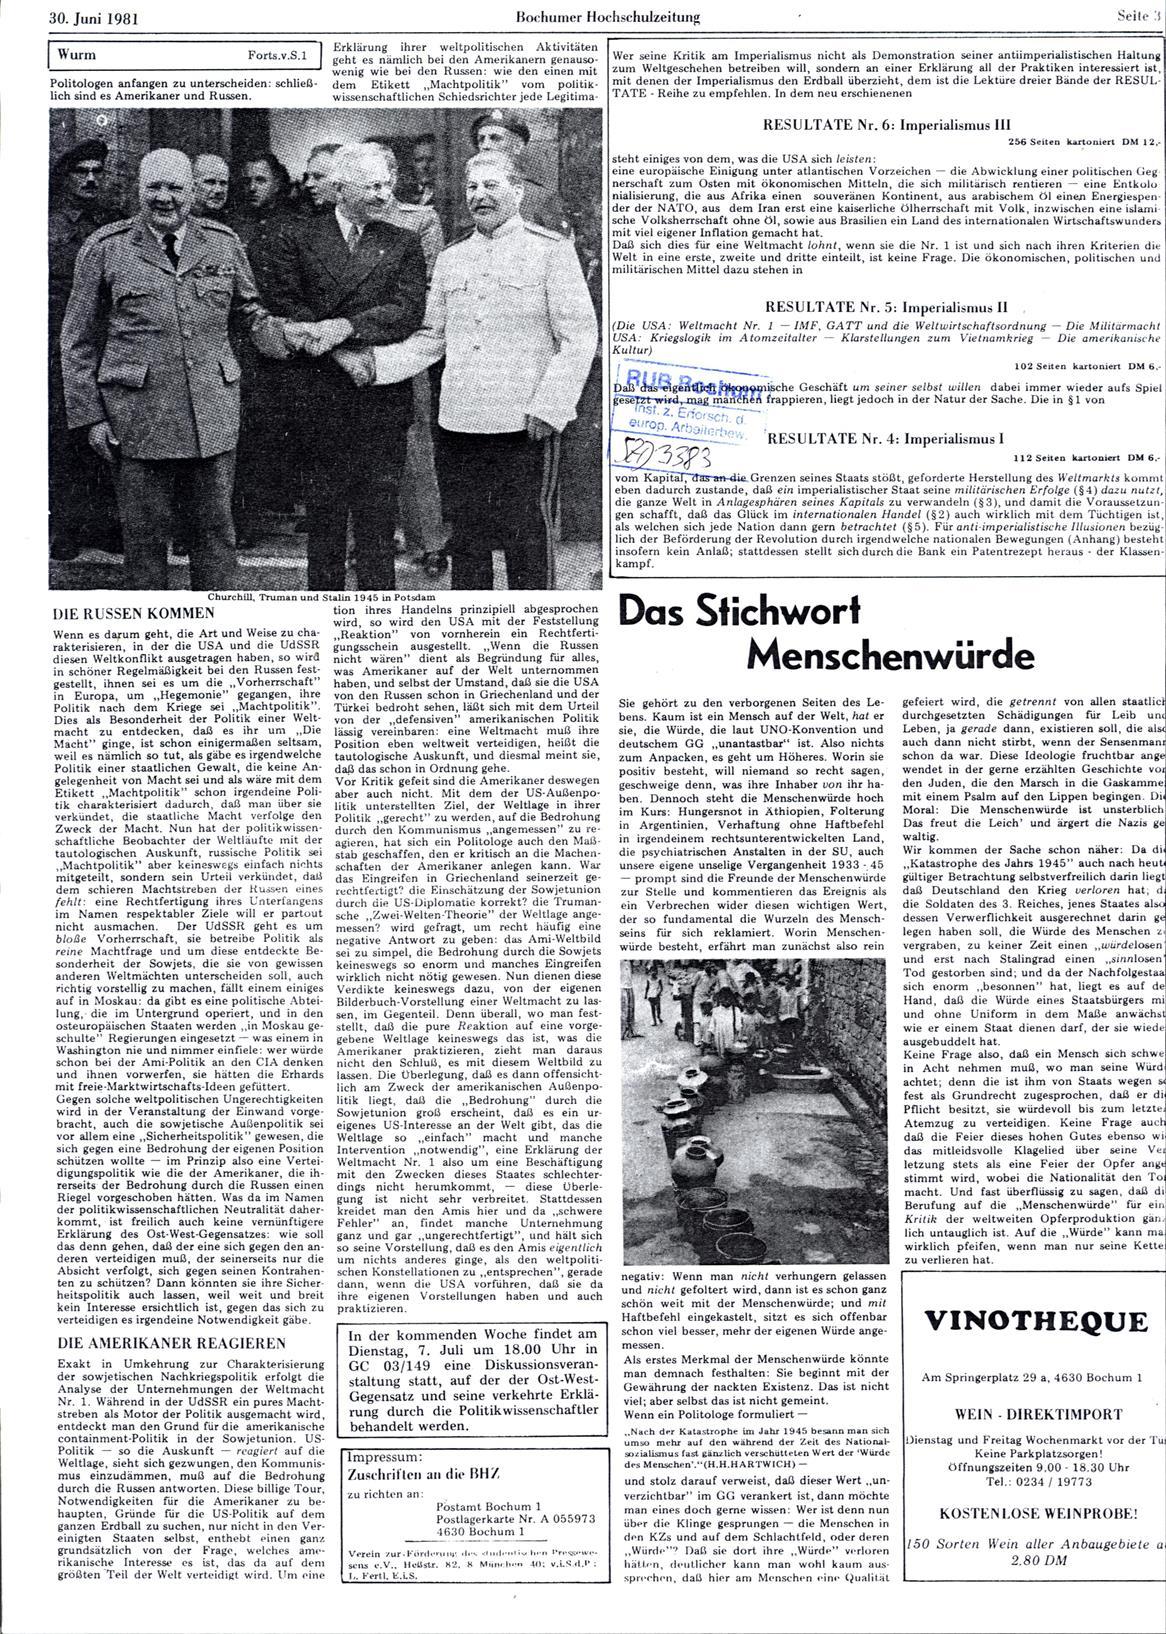 Bochum_BHZ_19810630_035_003